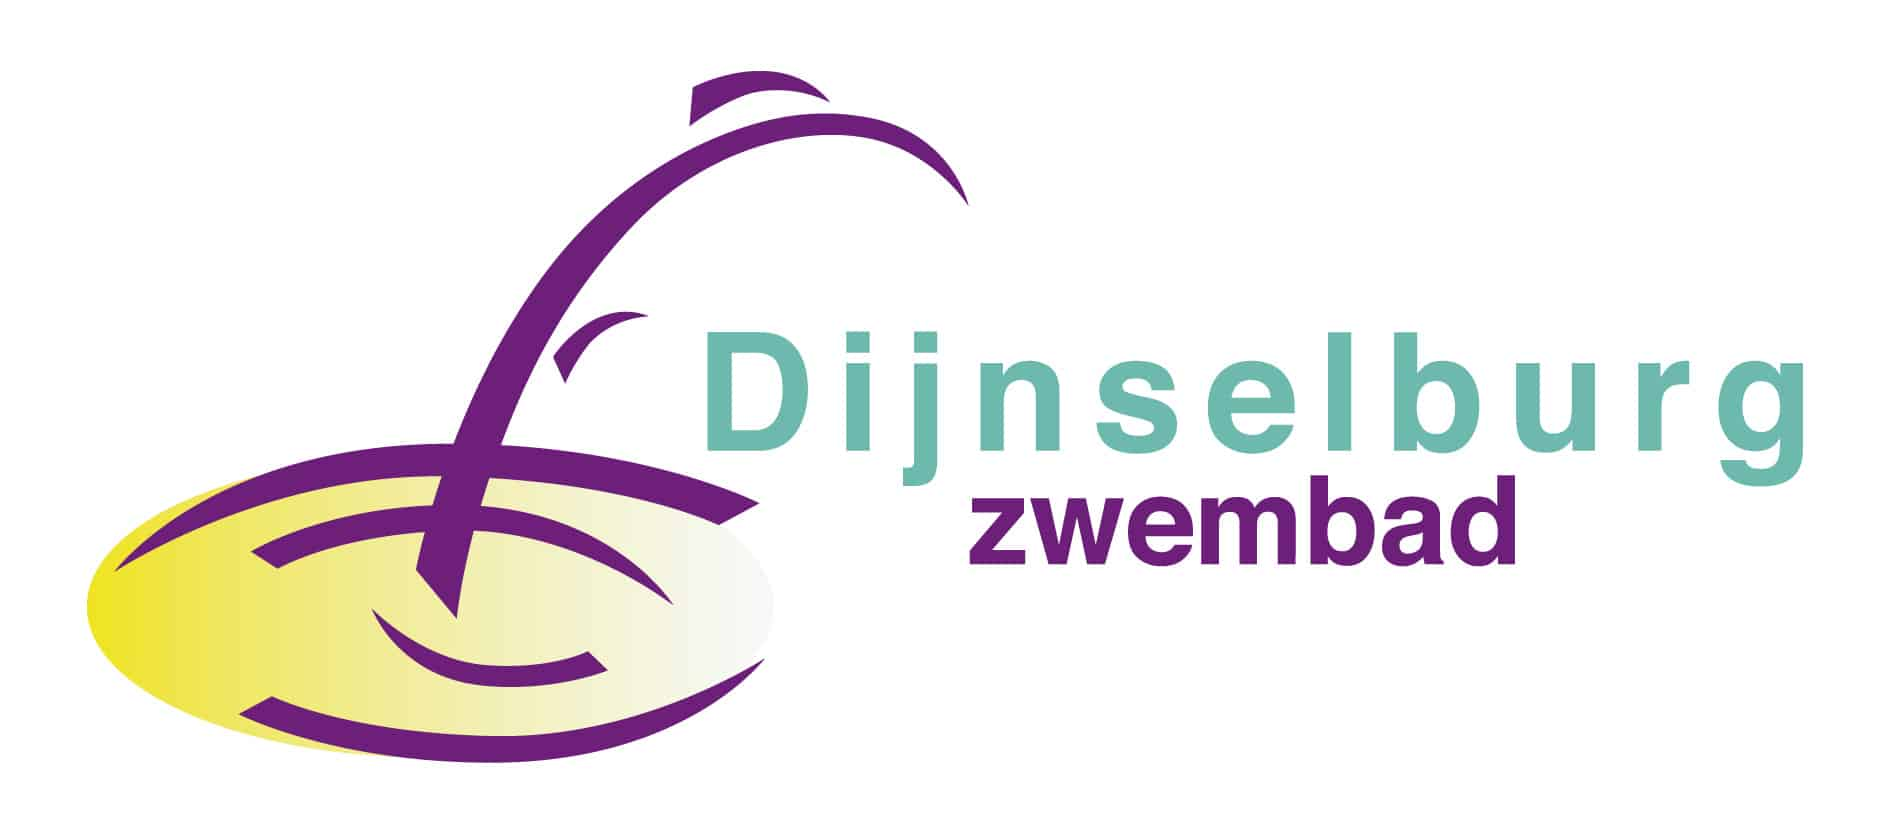 Zwembad Dijnselburg logo